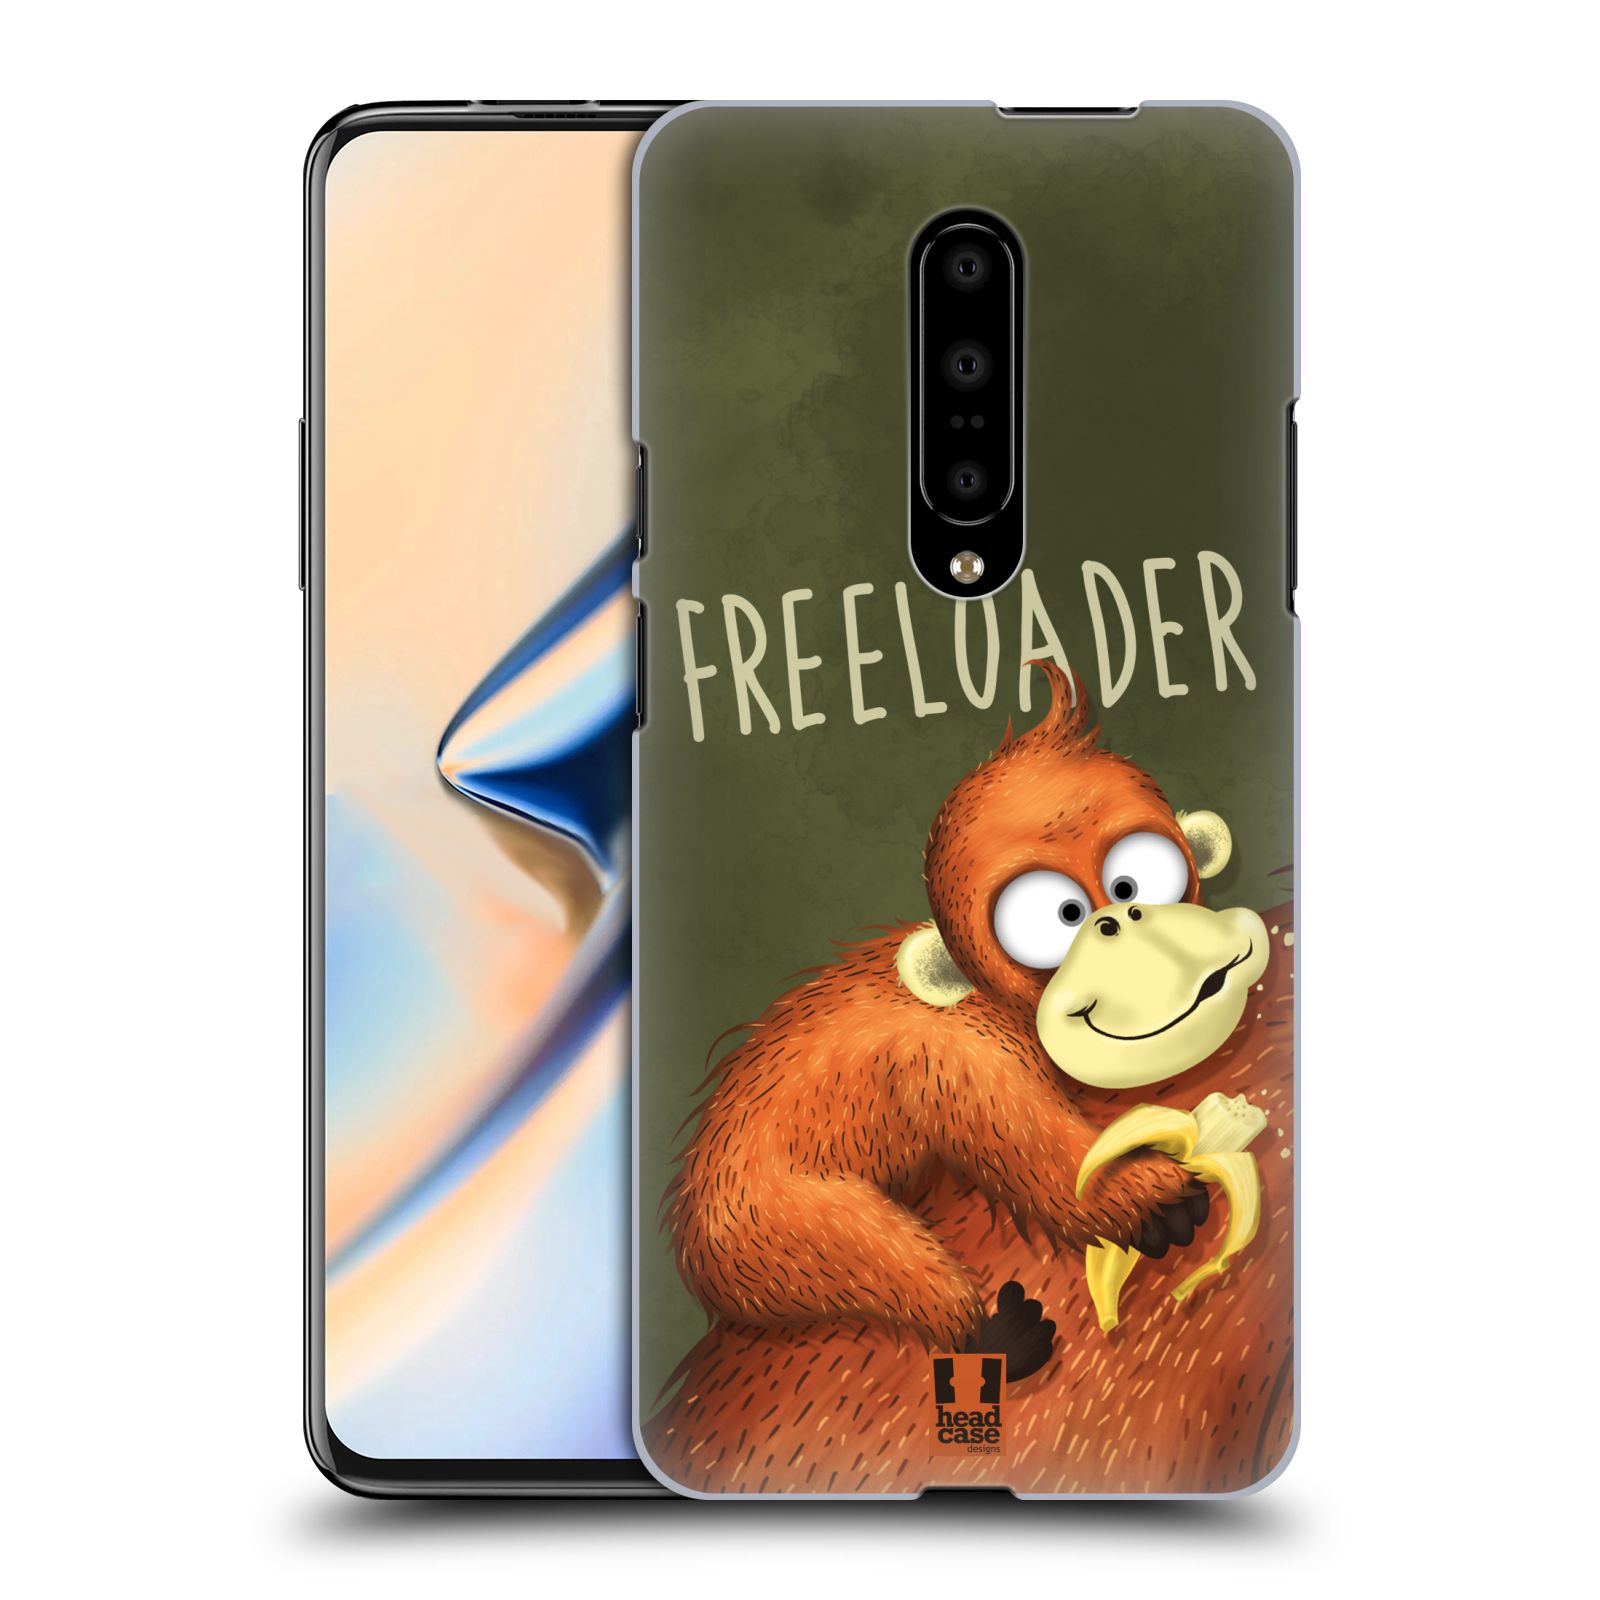 Plastové pouzdro na mobil OnePlus 7 - Head Case - Opičák Freeloader